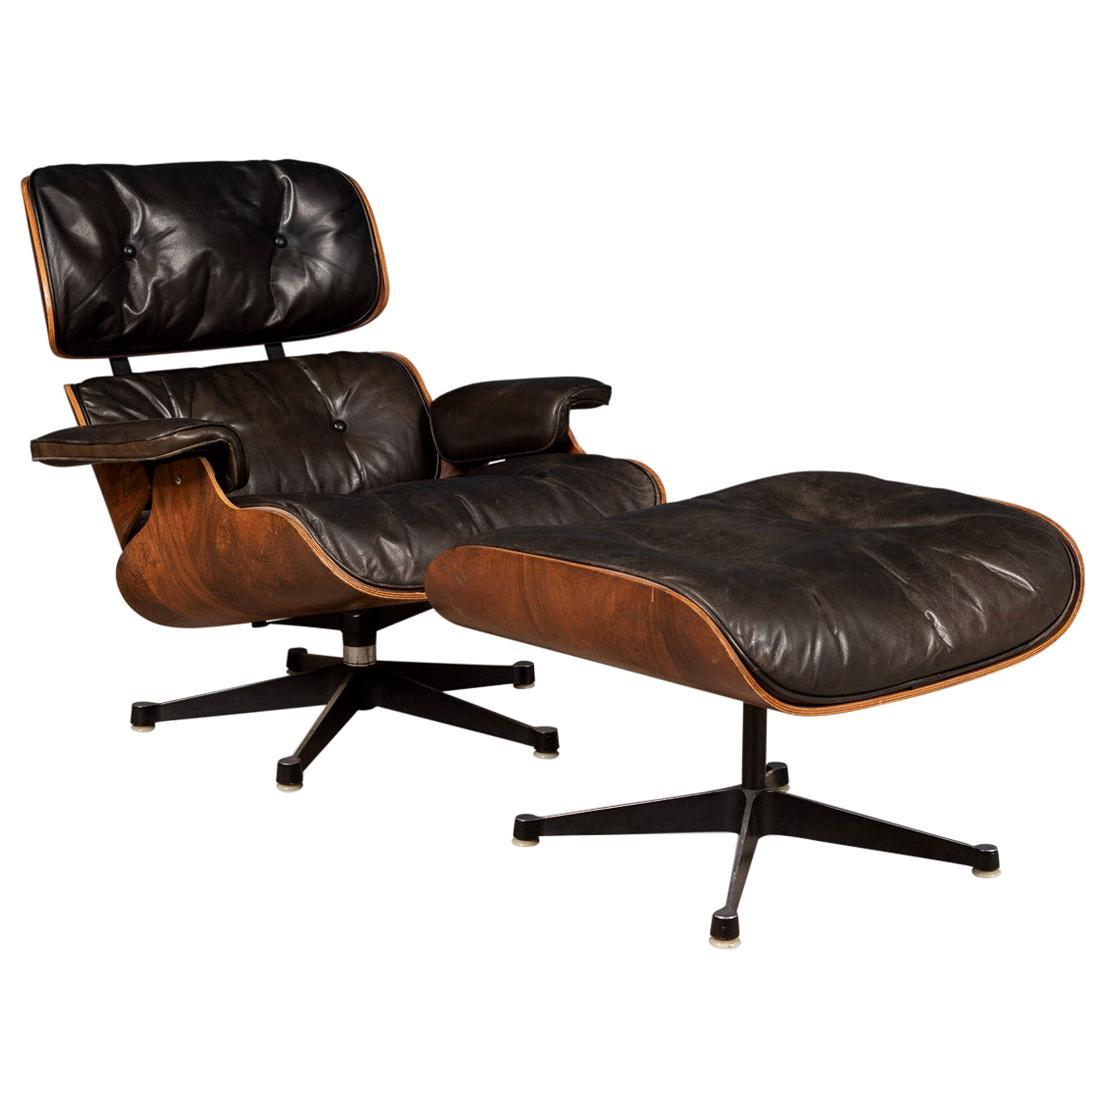 Second Series Eames Lounge Chair & Ottoman, Herman Miller, Circa 1970